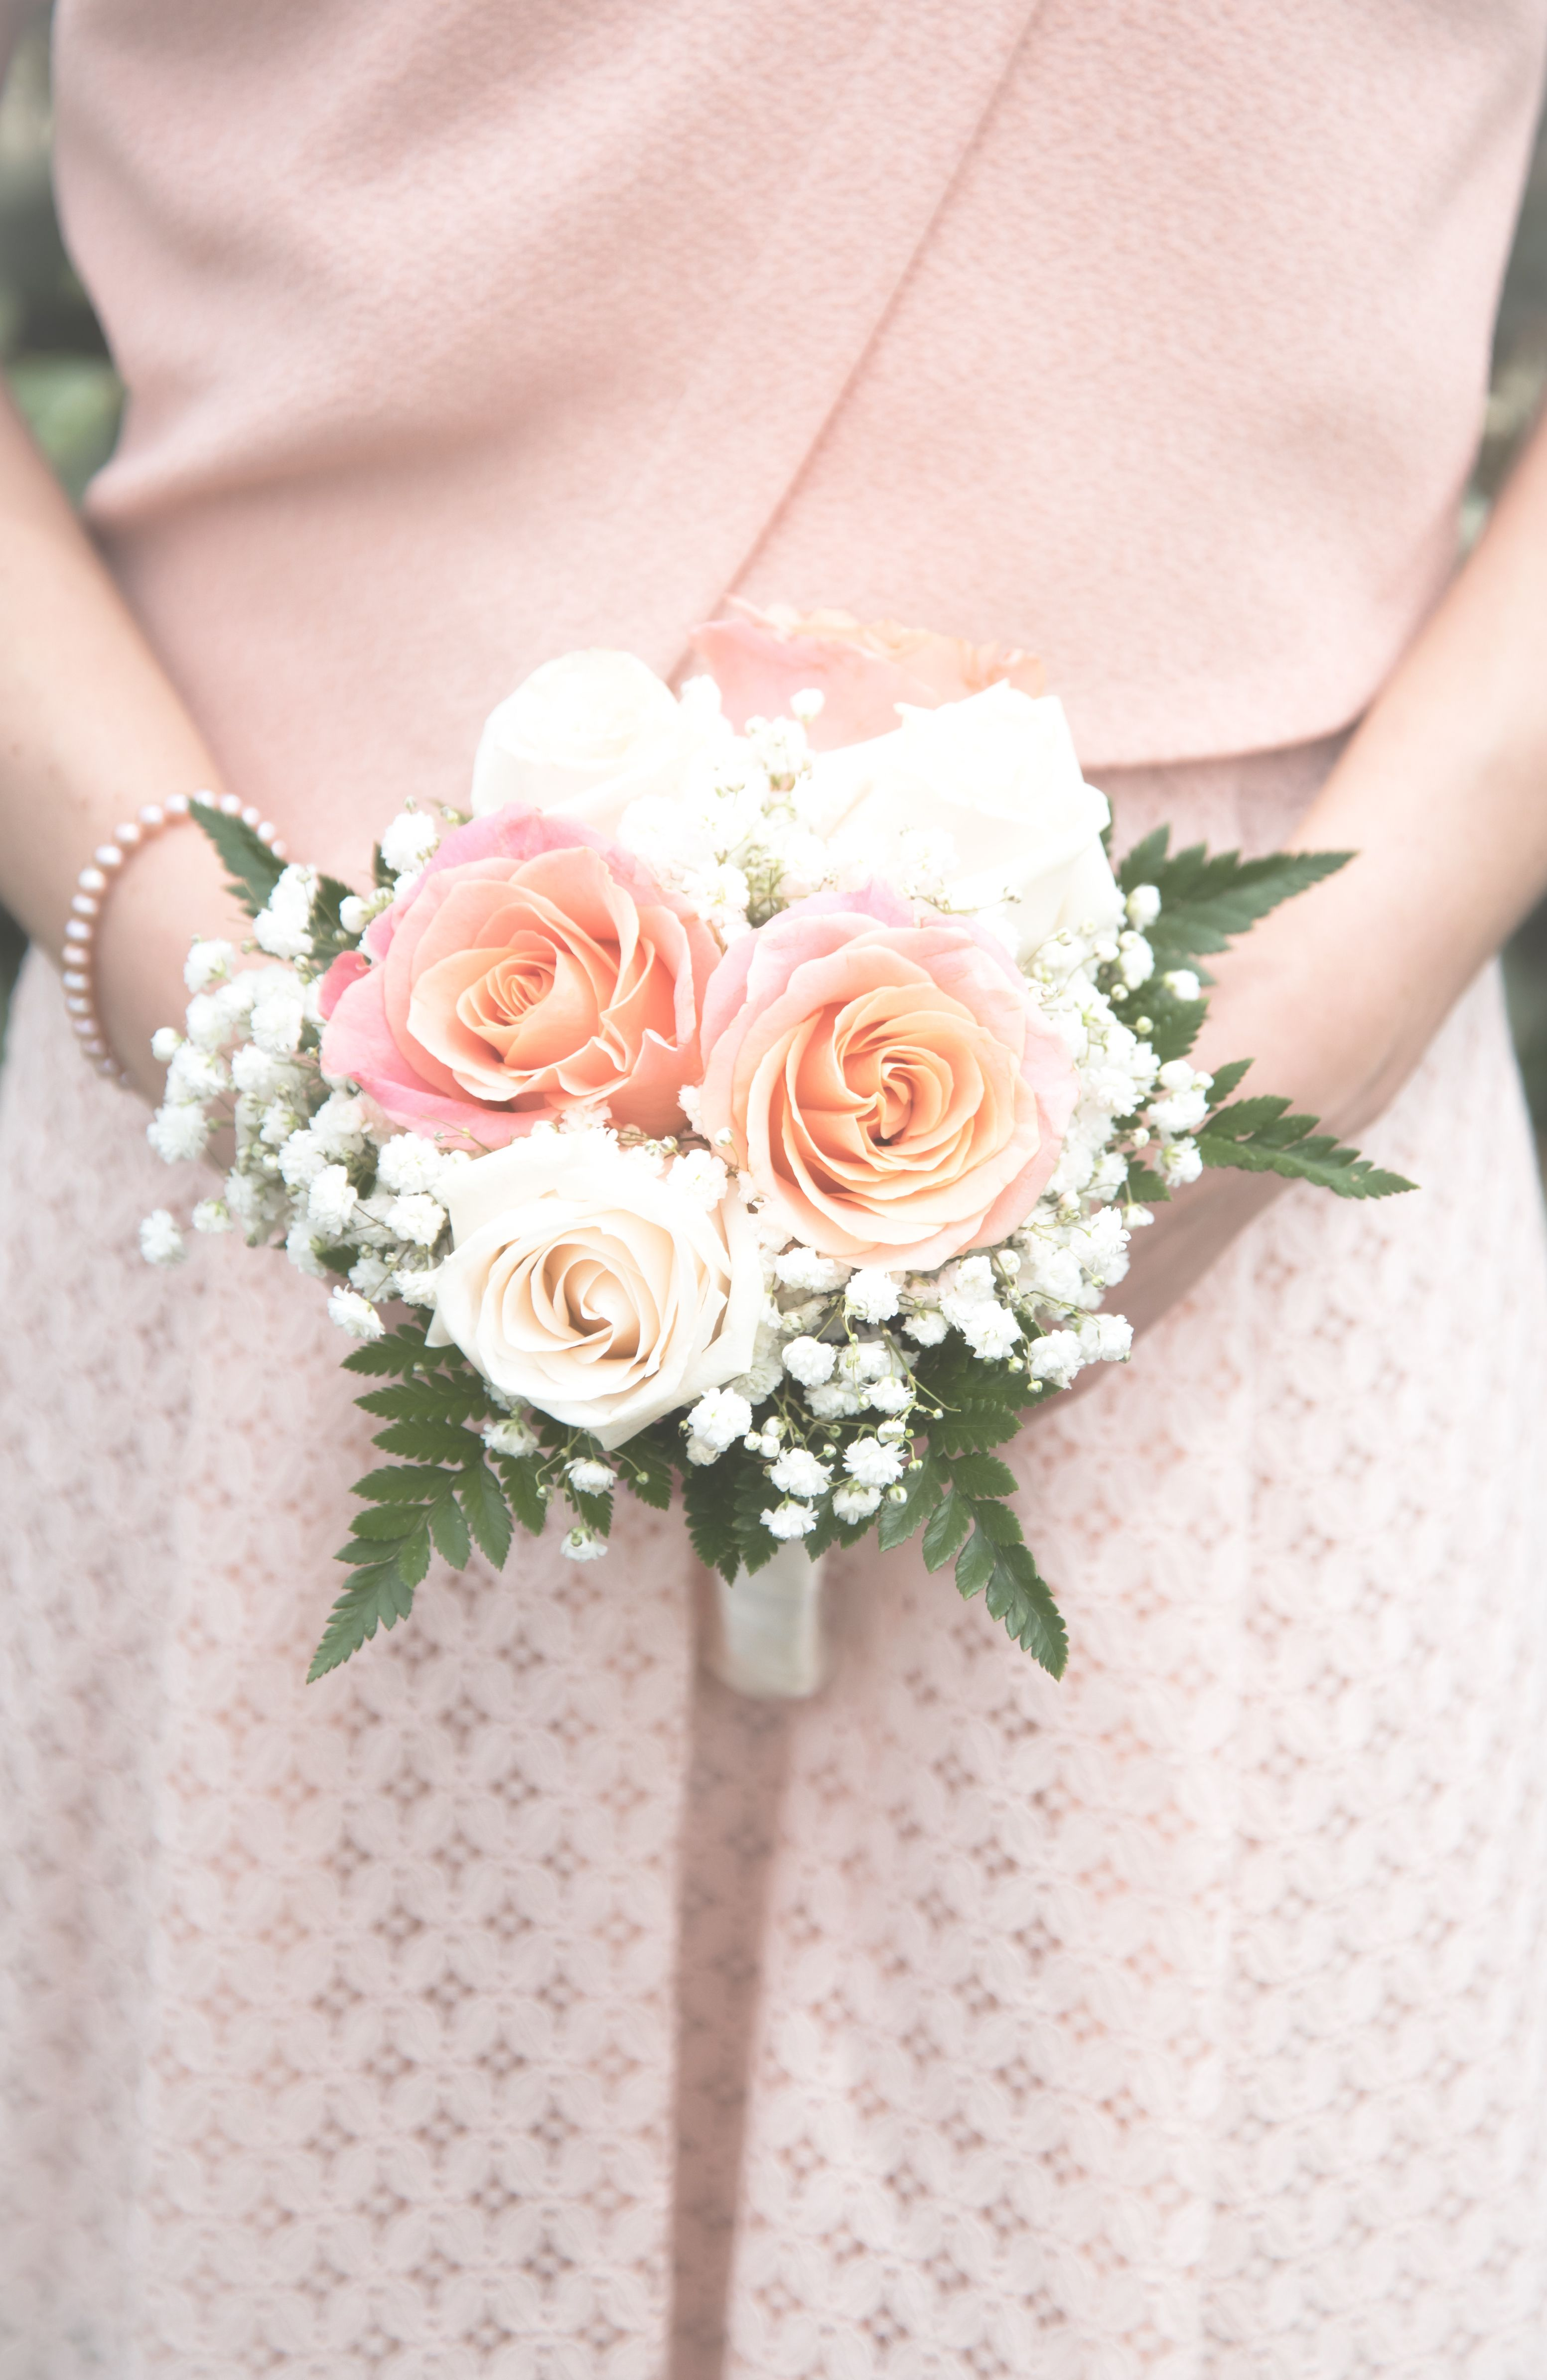 A little elegant bridesmaid bouquet Wedding day -wedding -destination -sardinia